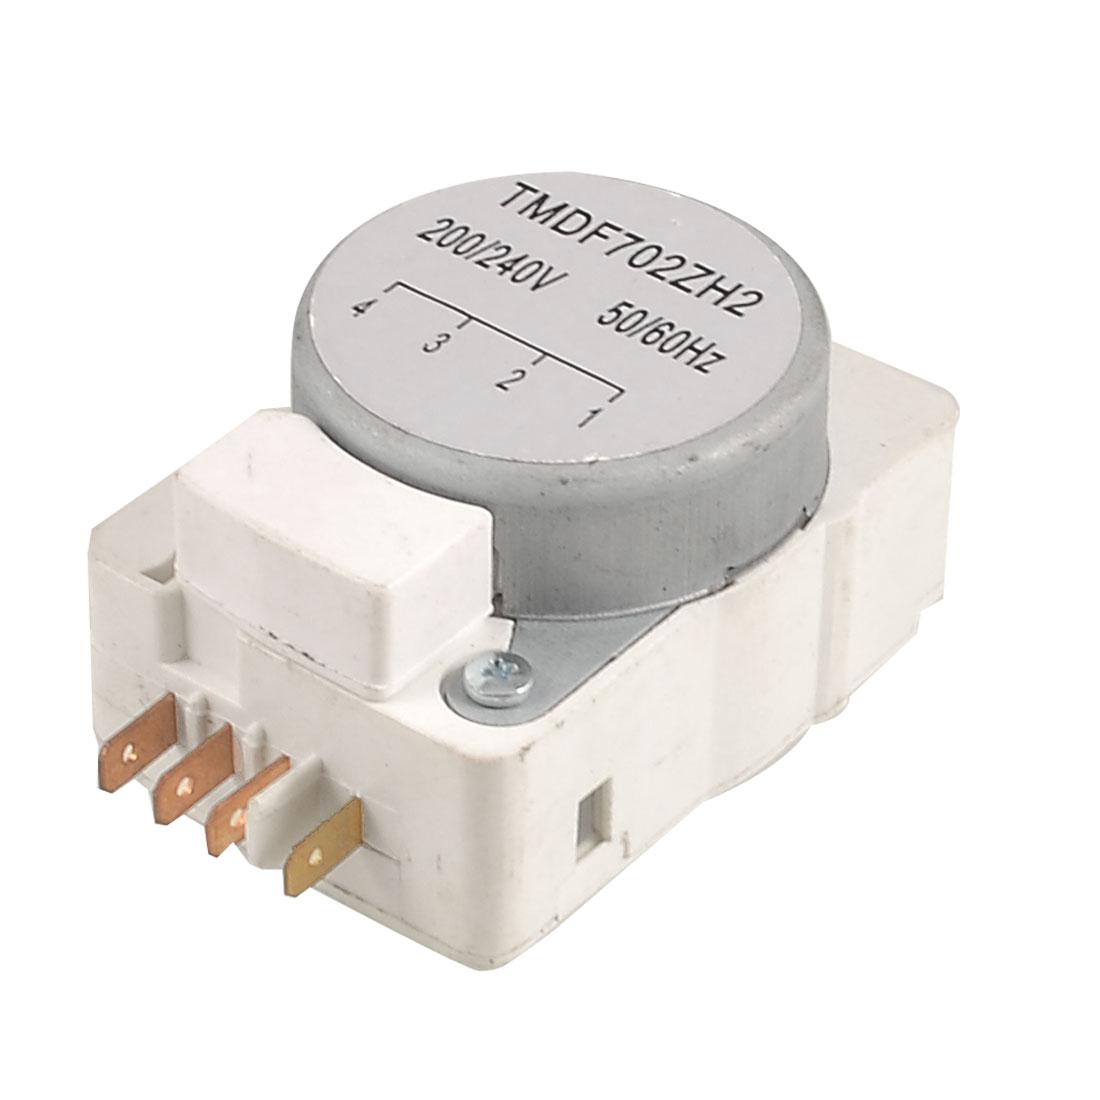 AC 200/240V 50Hz/60Hz DBY Series 4 Terminals Refrigerator Defrost Timer